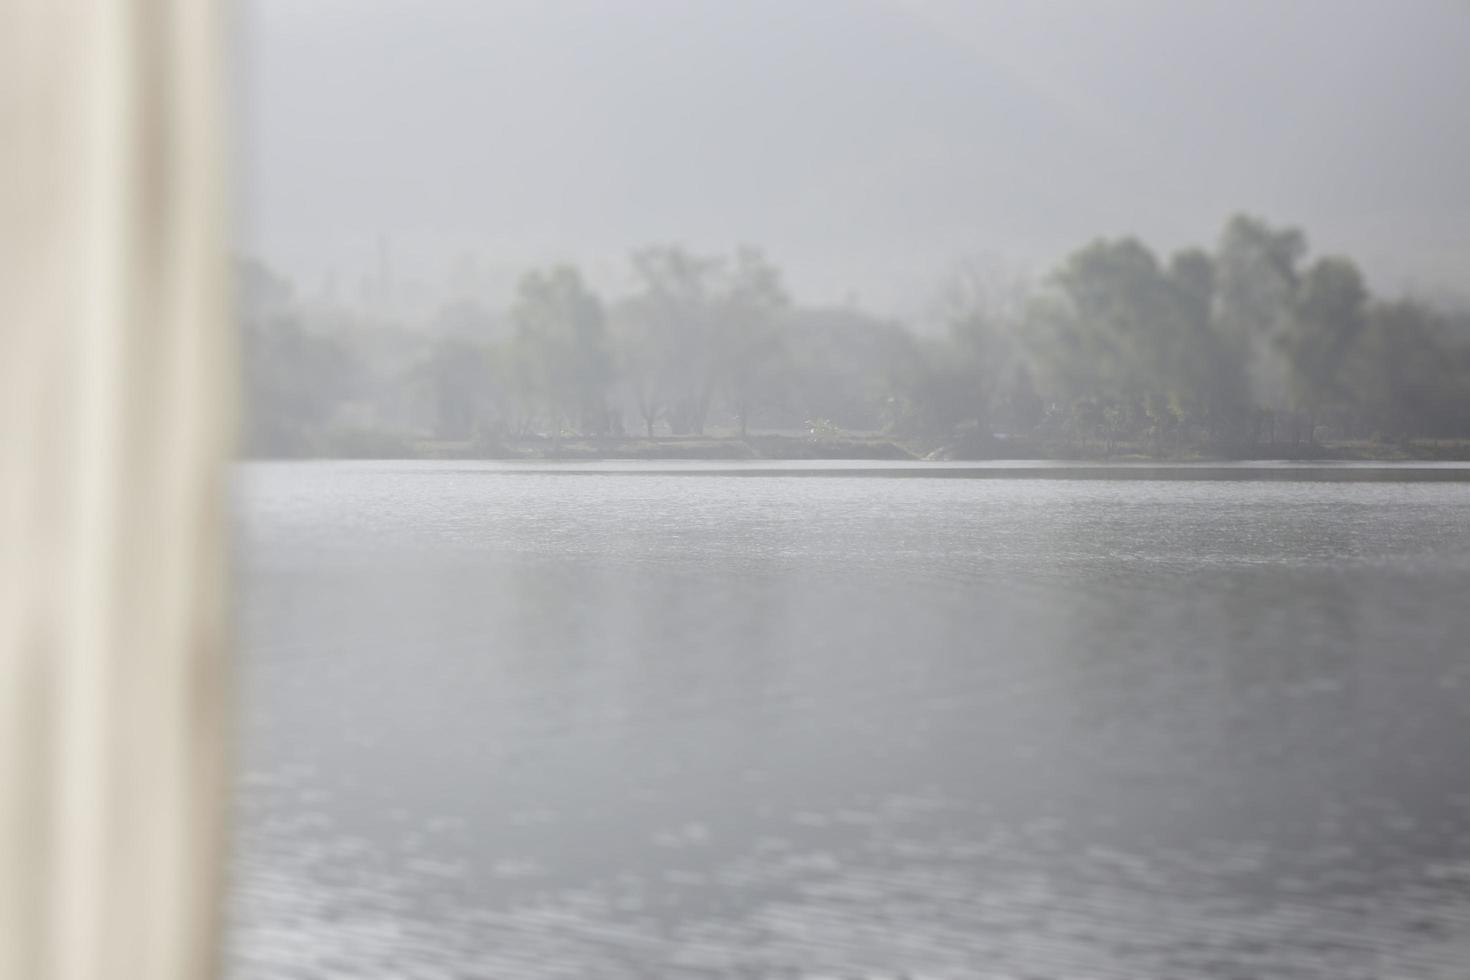 tenda e vista lago foto